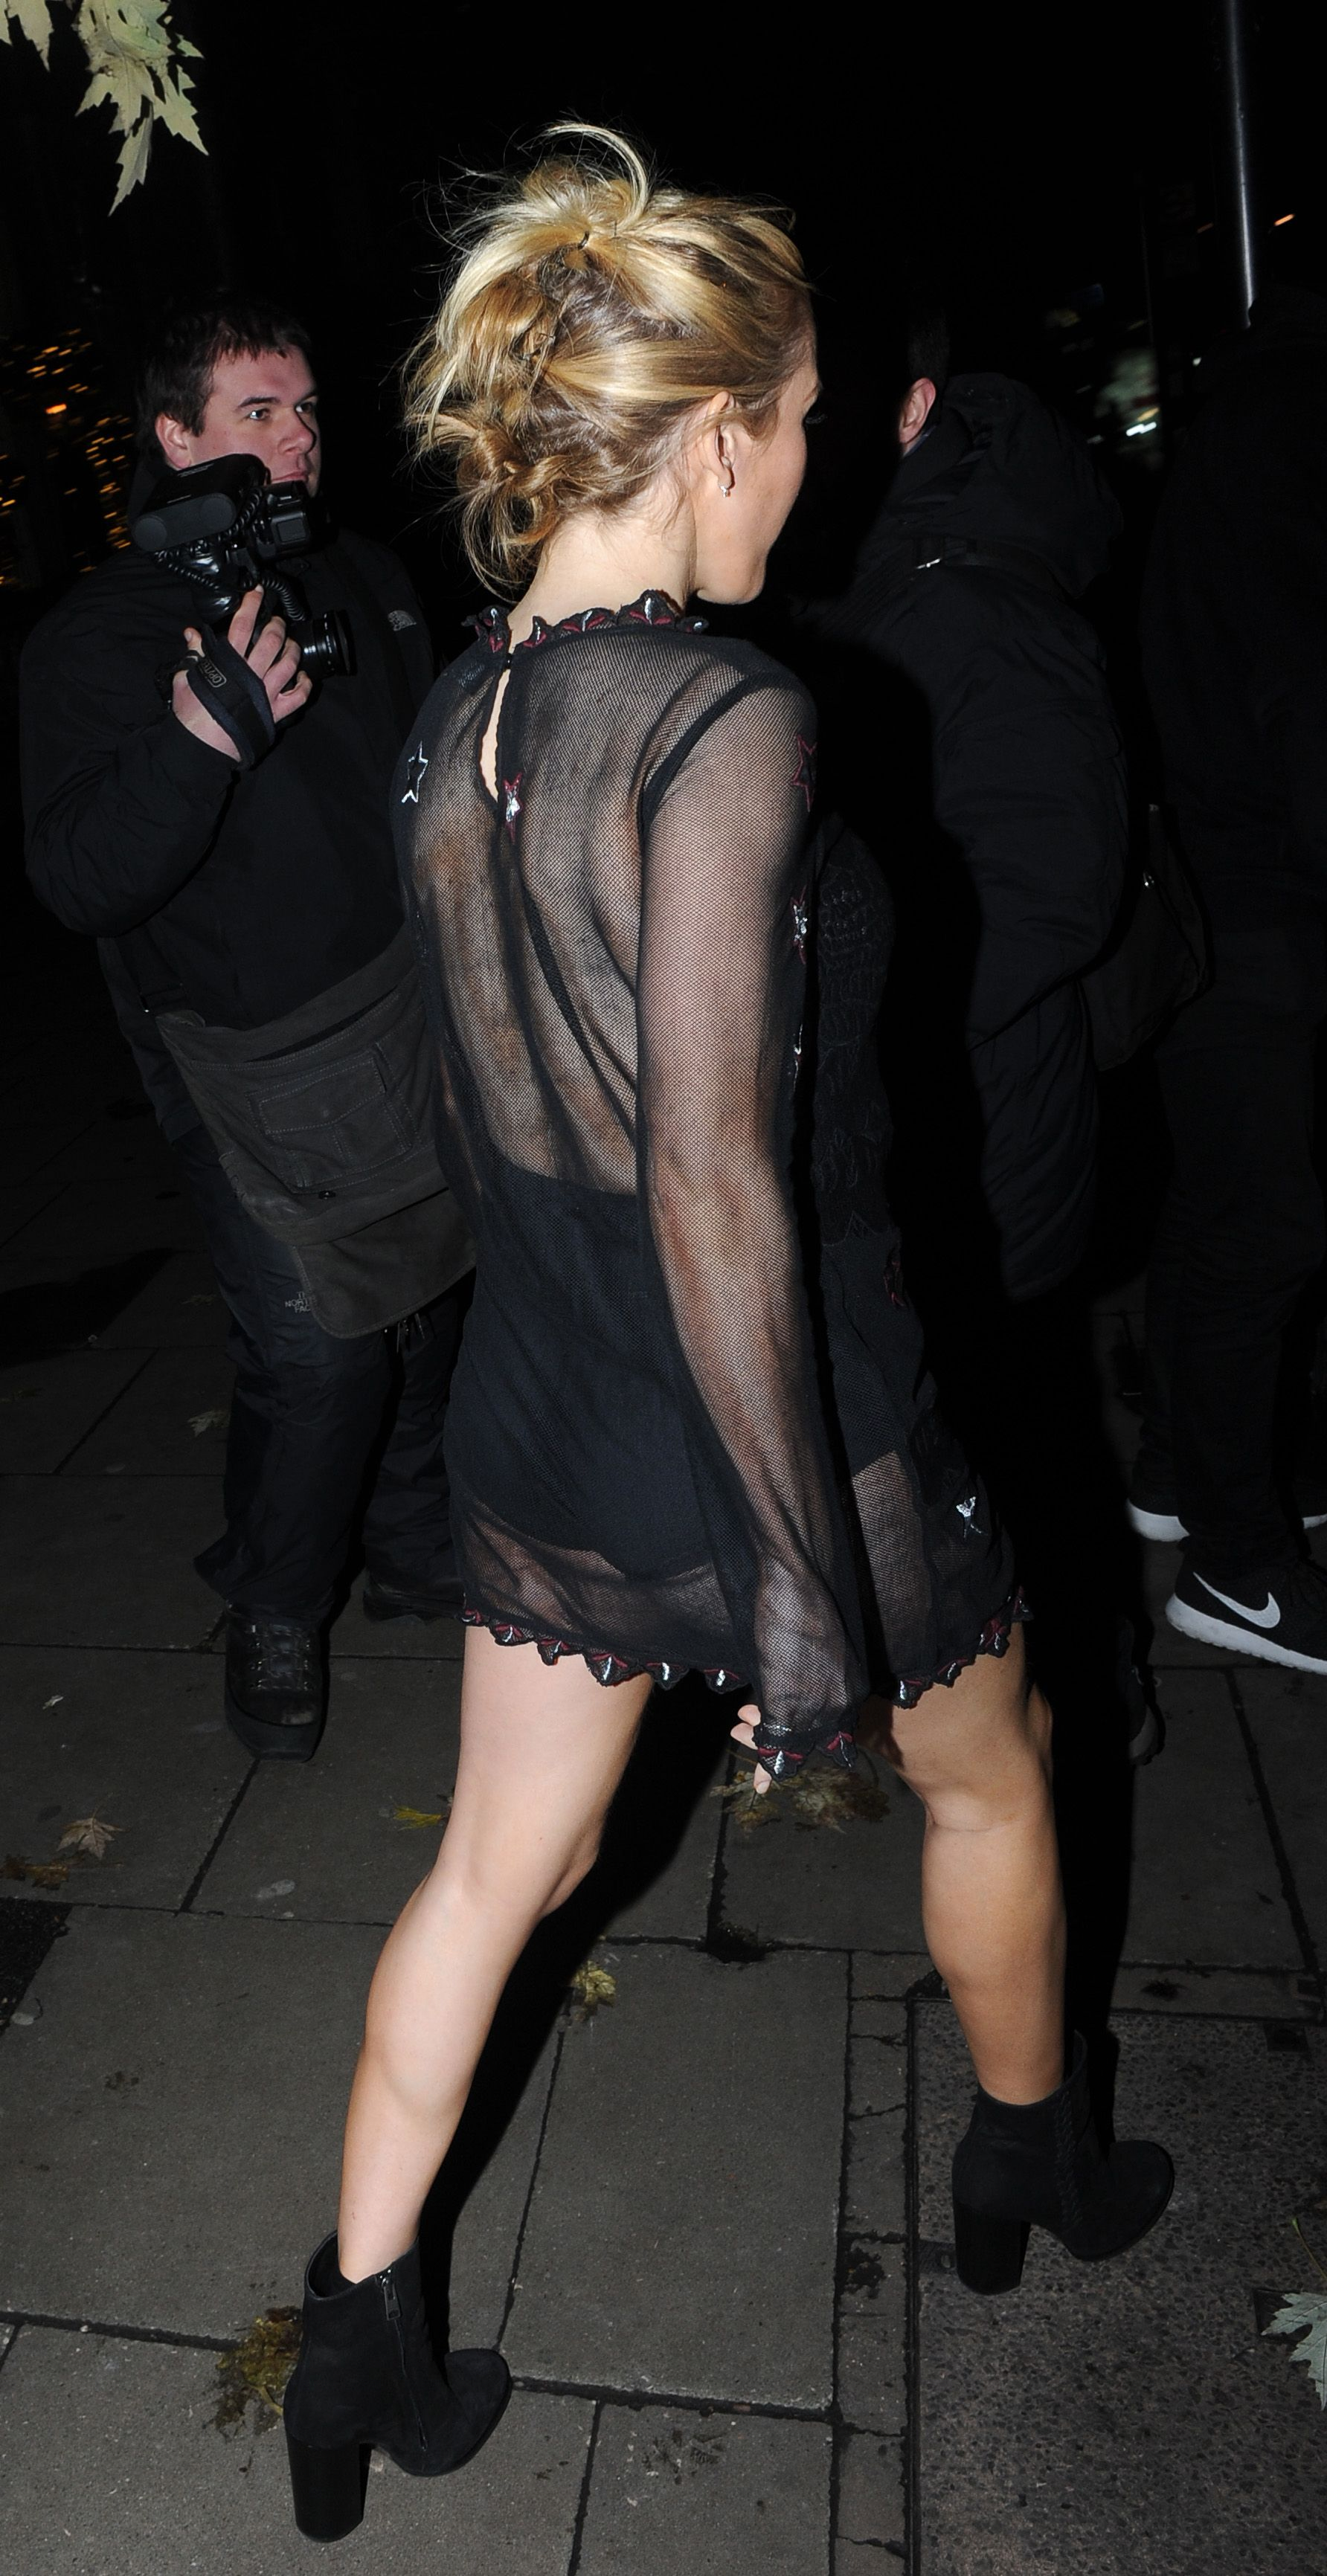 Ellie Goulding See-Through Photos